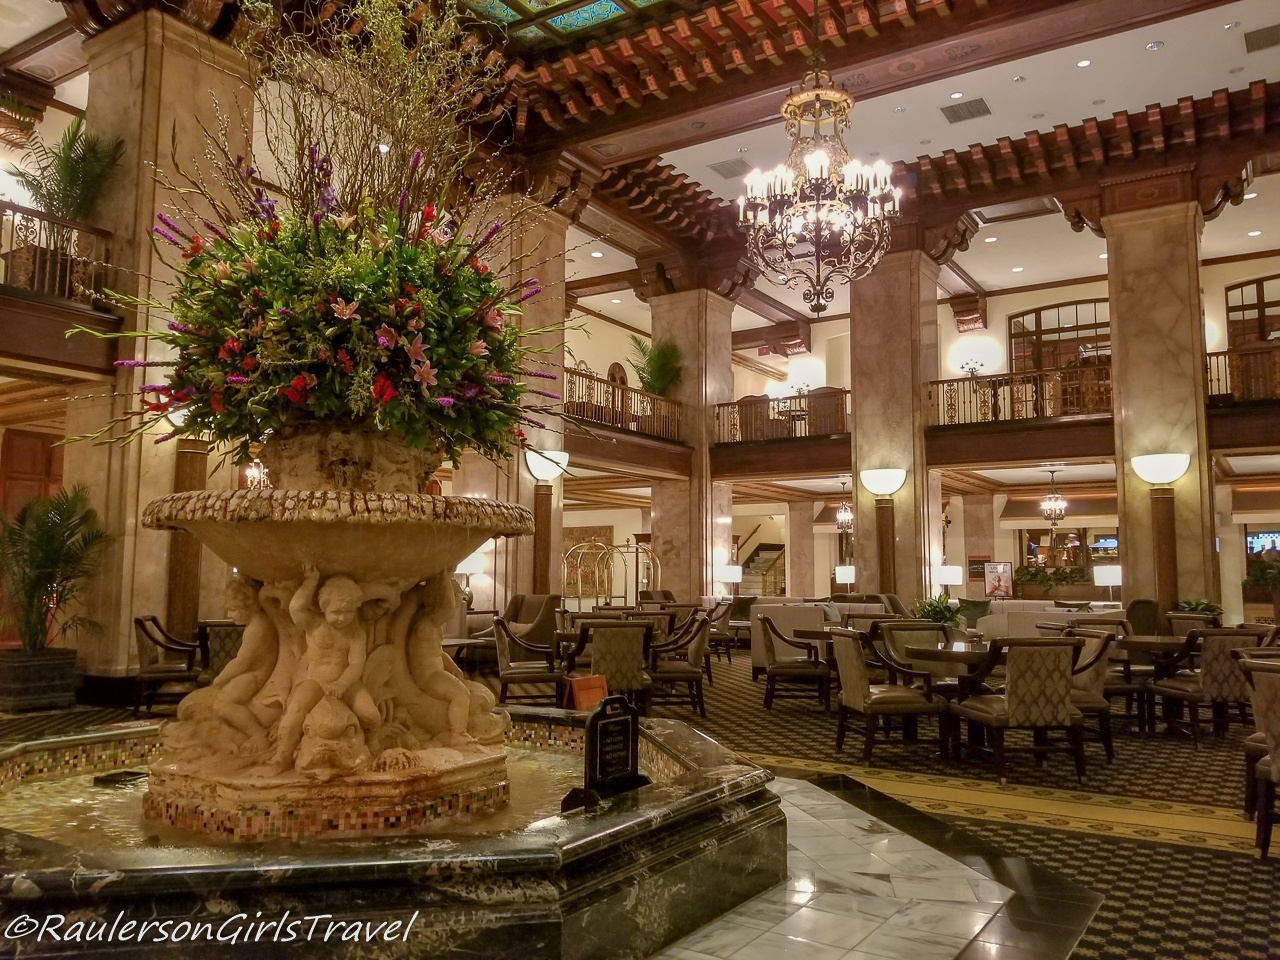 The Peabody Hotel in Memphis